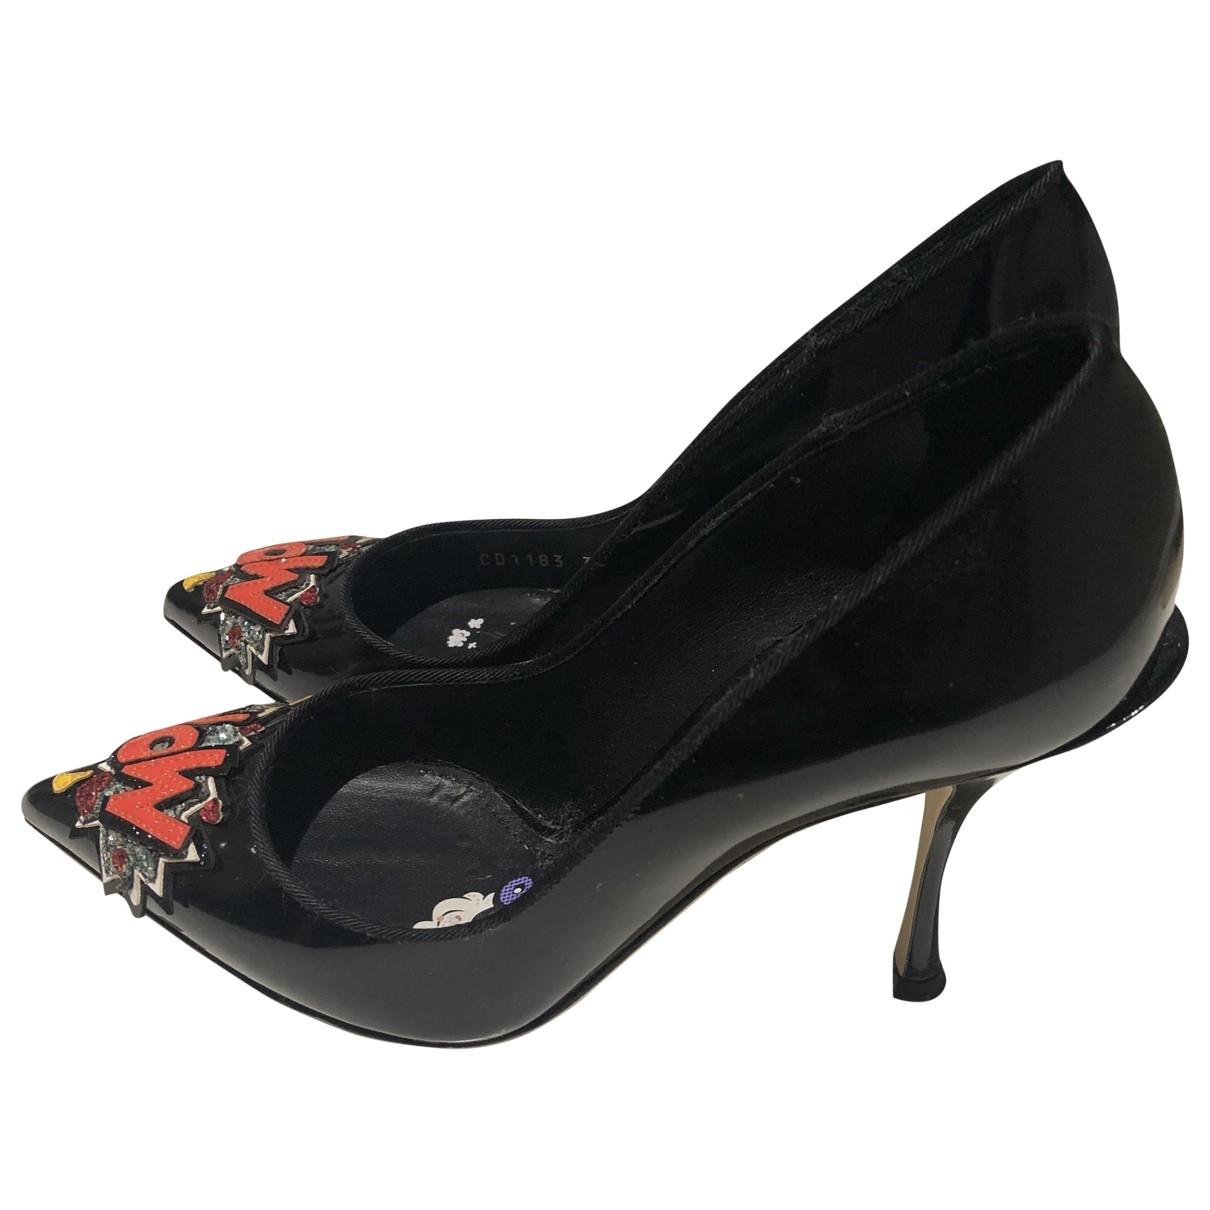 D&g \N Black Patent leather Heels for Women 37 EU